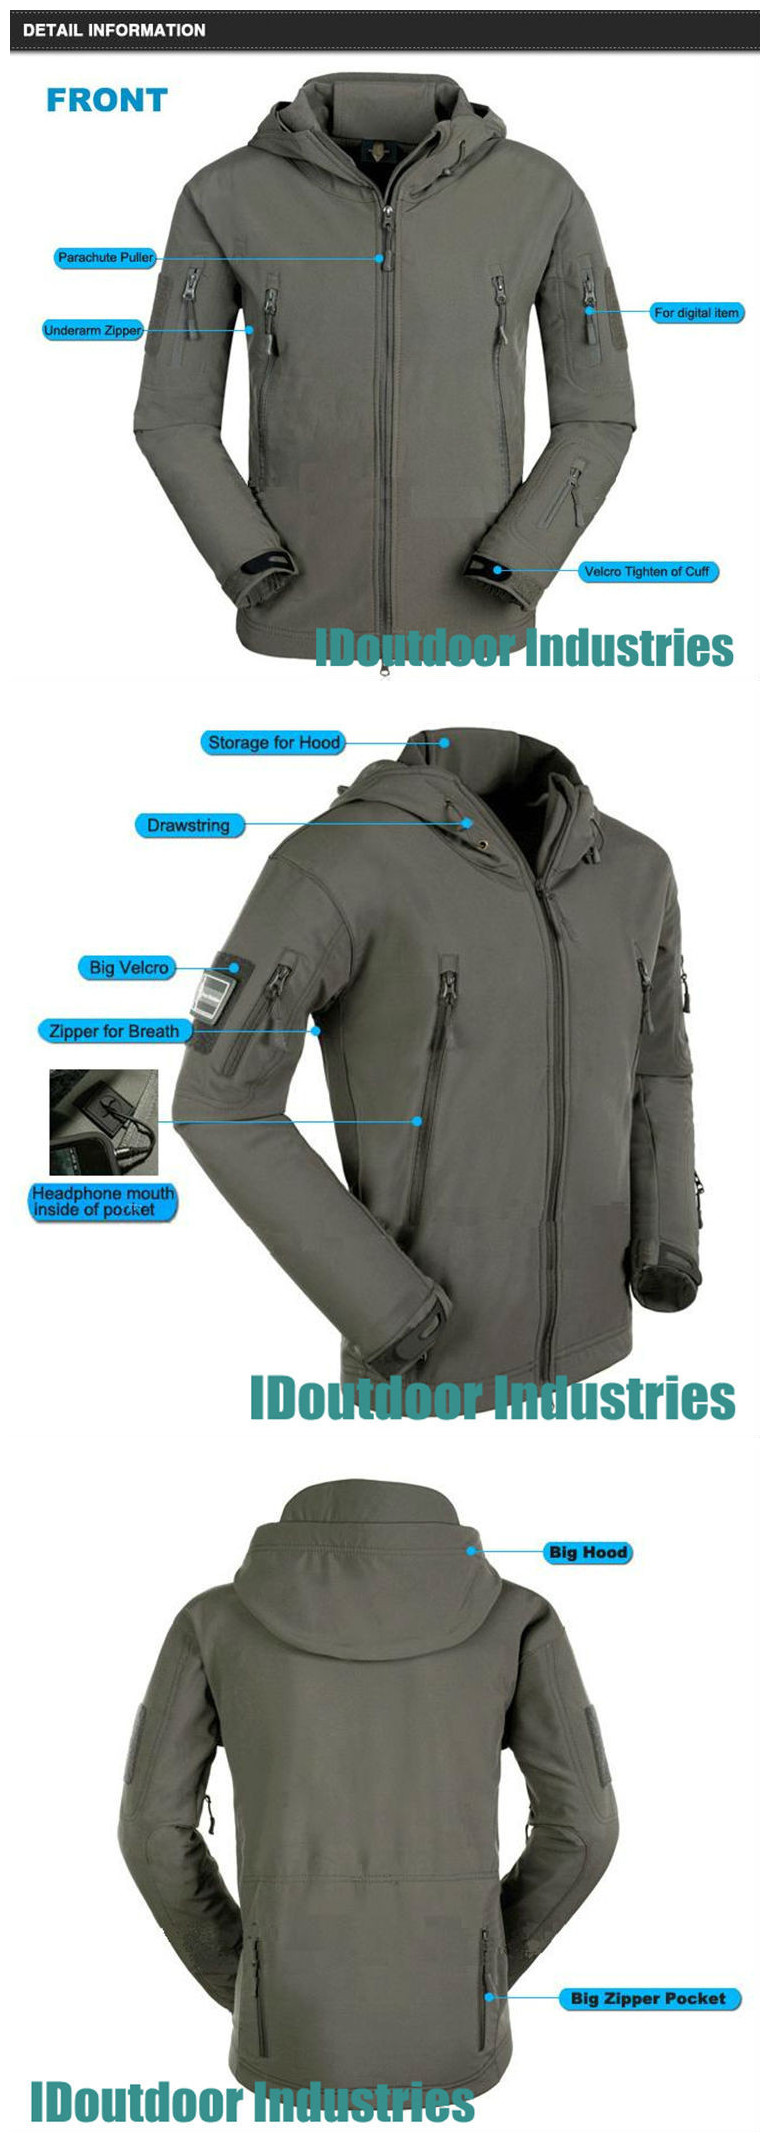 Outdoor Sport Softshell Tad Tactical Sets Mens Camouflage Hunting Jacket Inner Polar Safety Htb1ai6npvxxxxblaxxxq6xxfxxxn 20151130 203413 008